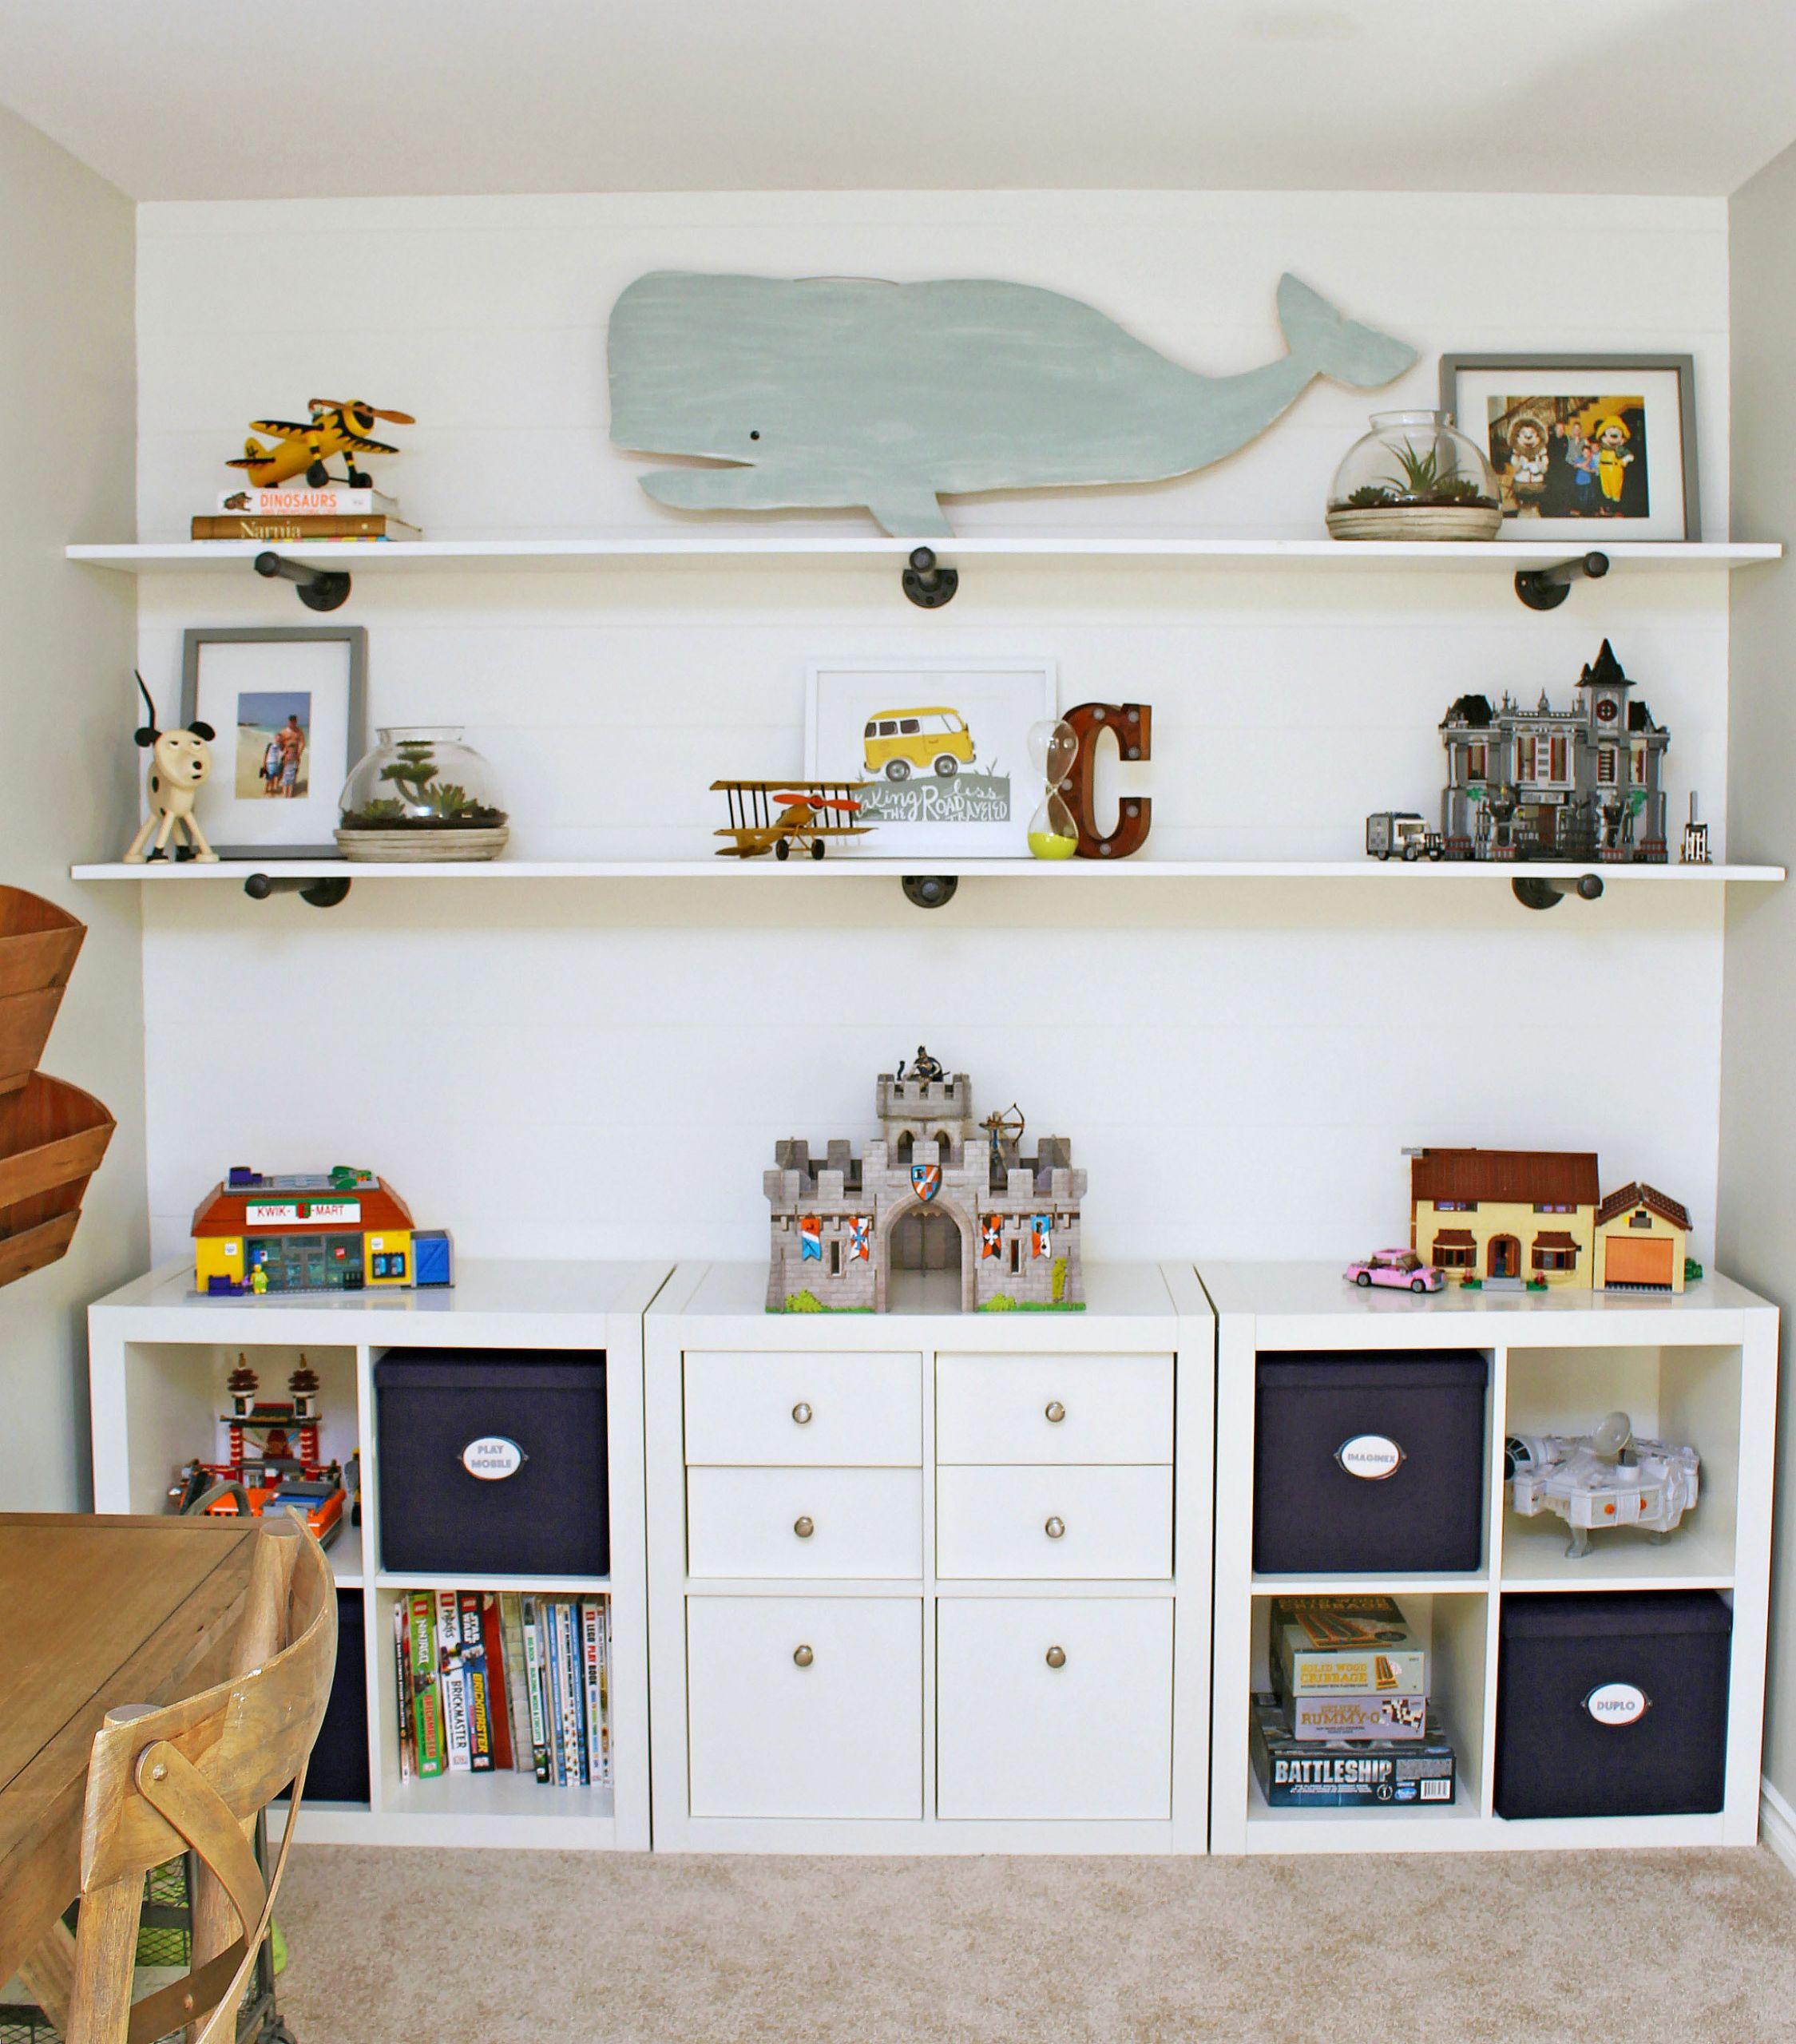 Kids Bedroom Storage  Kids Bedroom Organization August HOD Clean and Scentsible